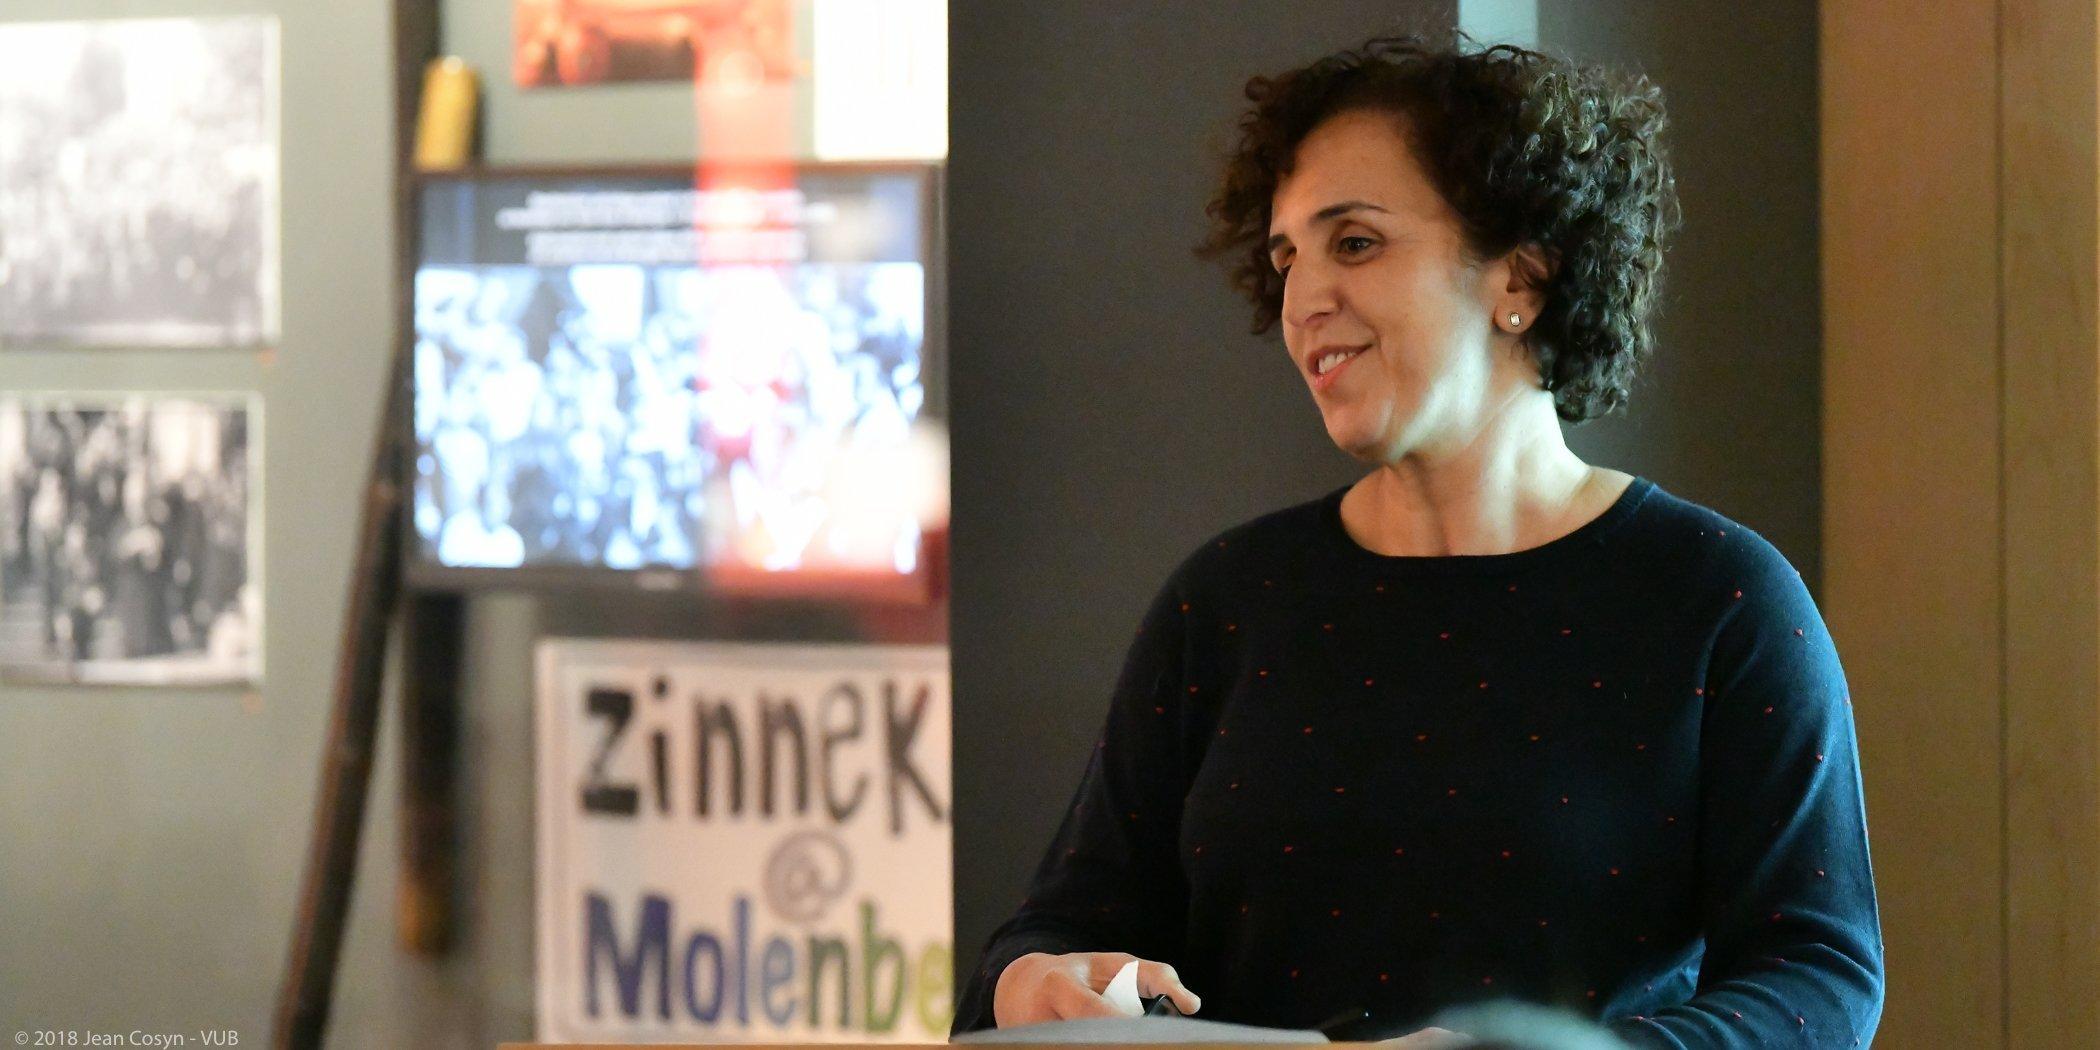 20181123-030 VUB MoMuse Sophie DS Boekvoorstelling